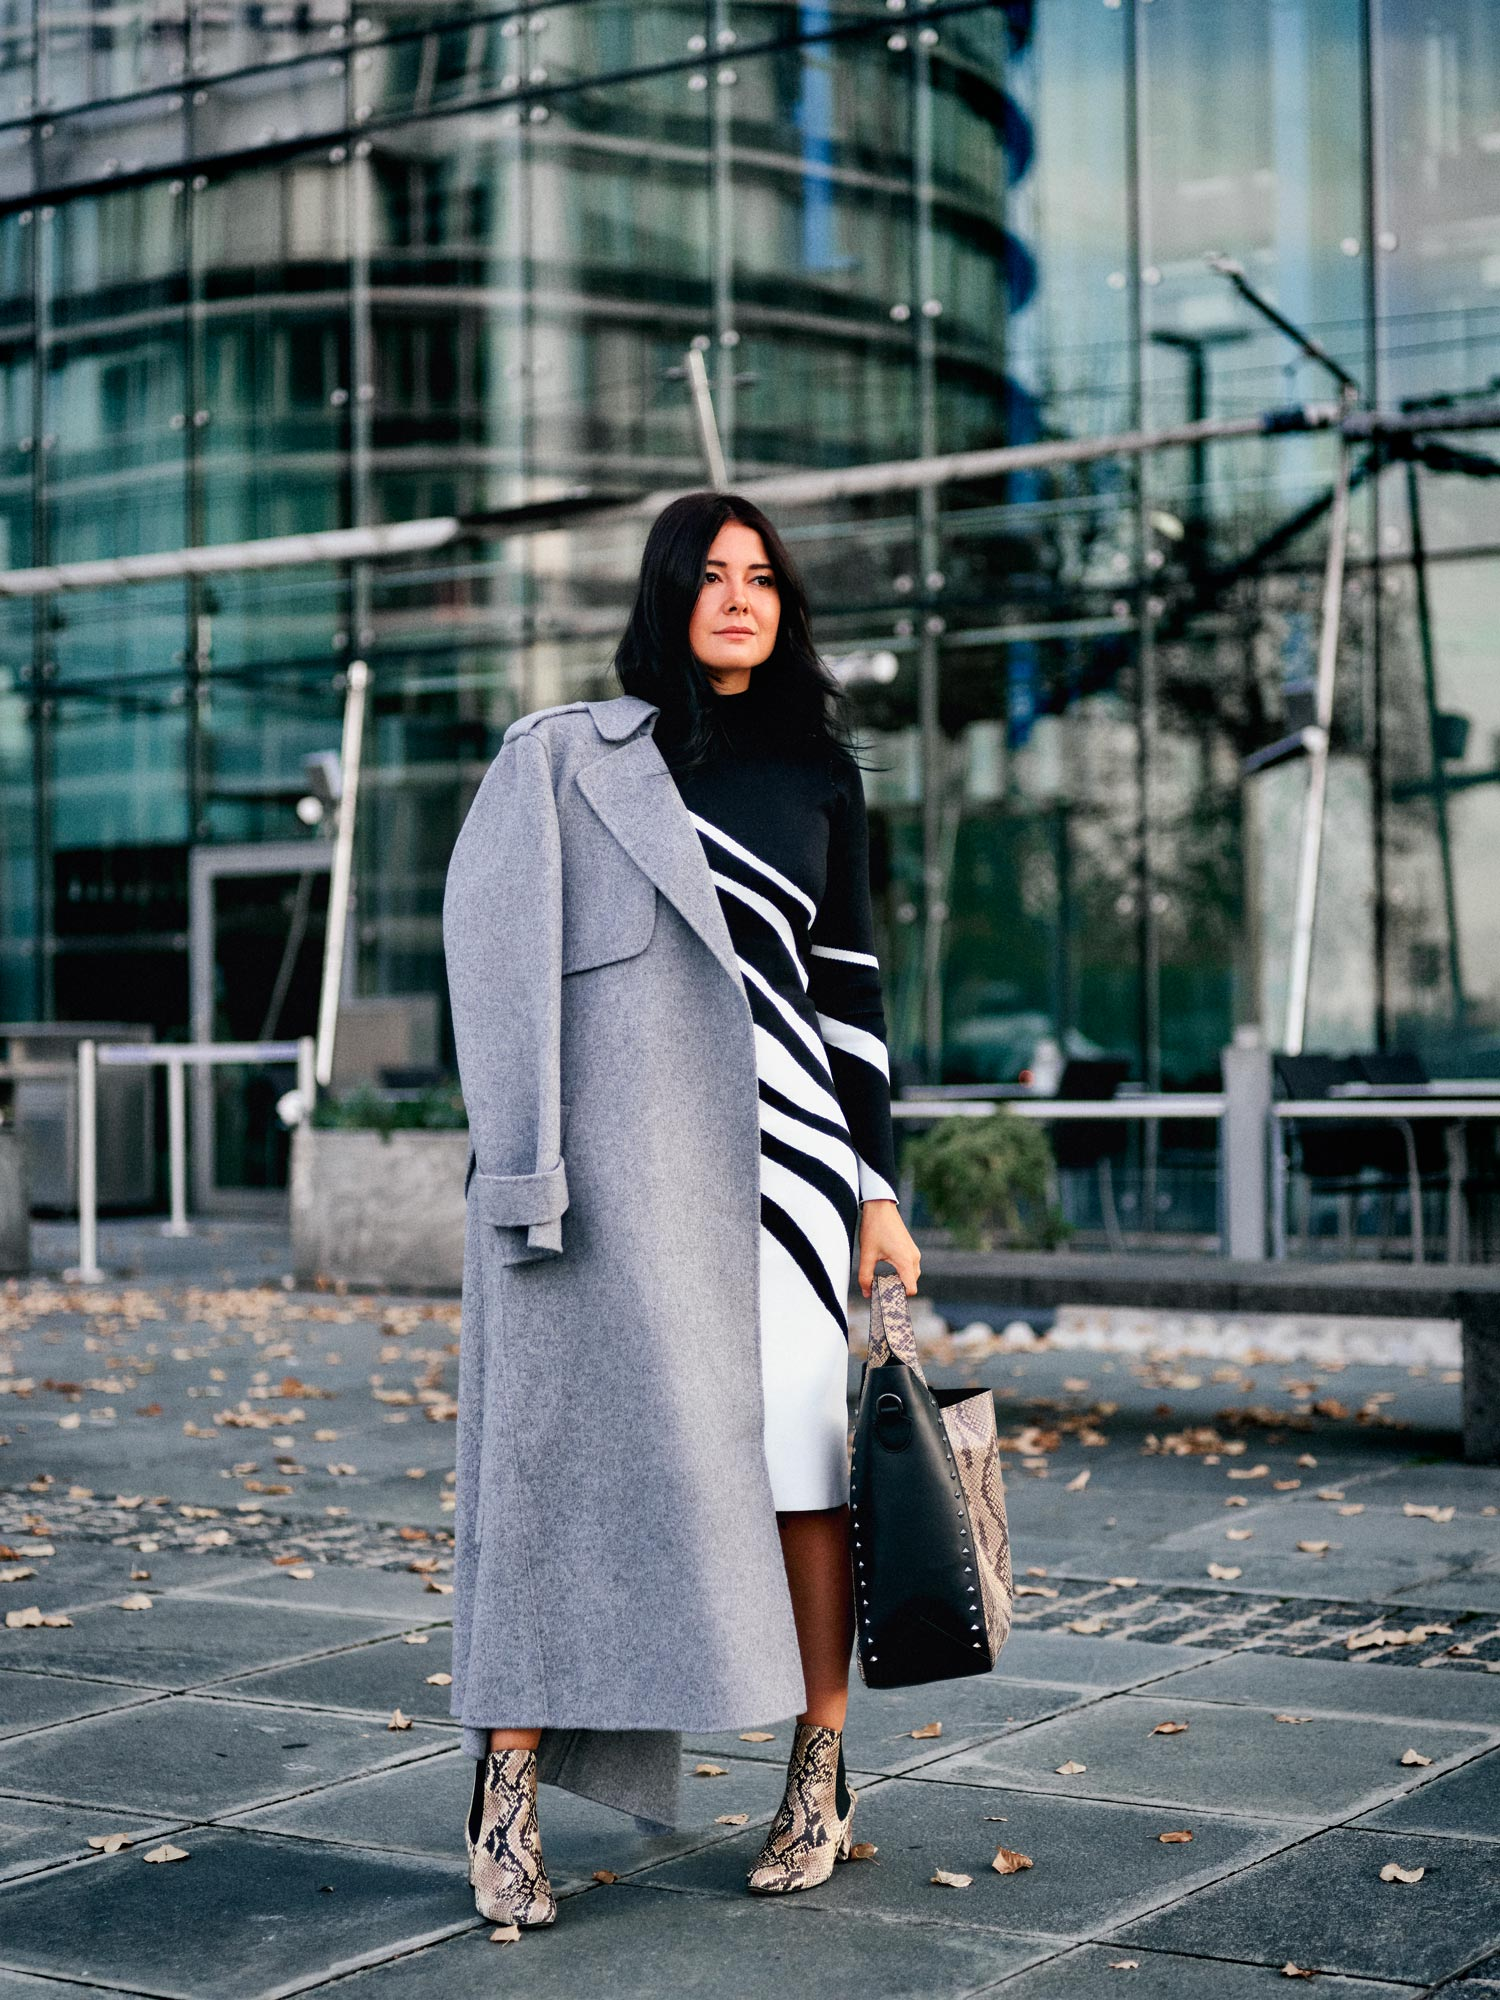 bloggerdeutschland-fashionblogger-fashion-blogger-modeblogger-modeblog-munich-blog-fashionblogger-muenchen-minimalistic-chic-trifft-must-er-have